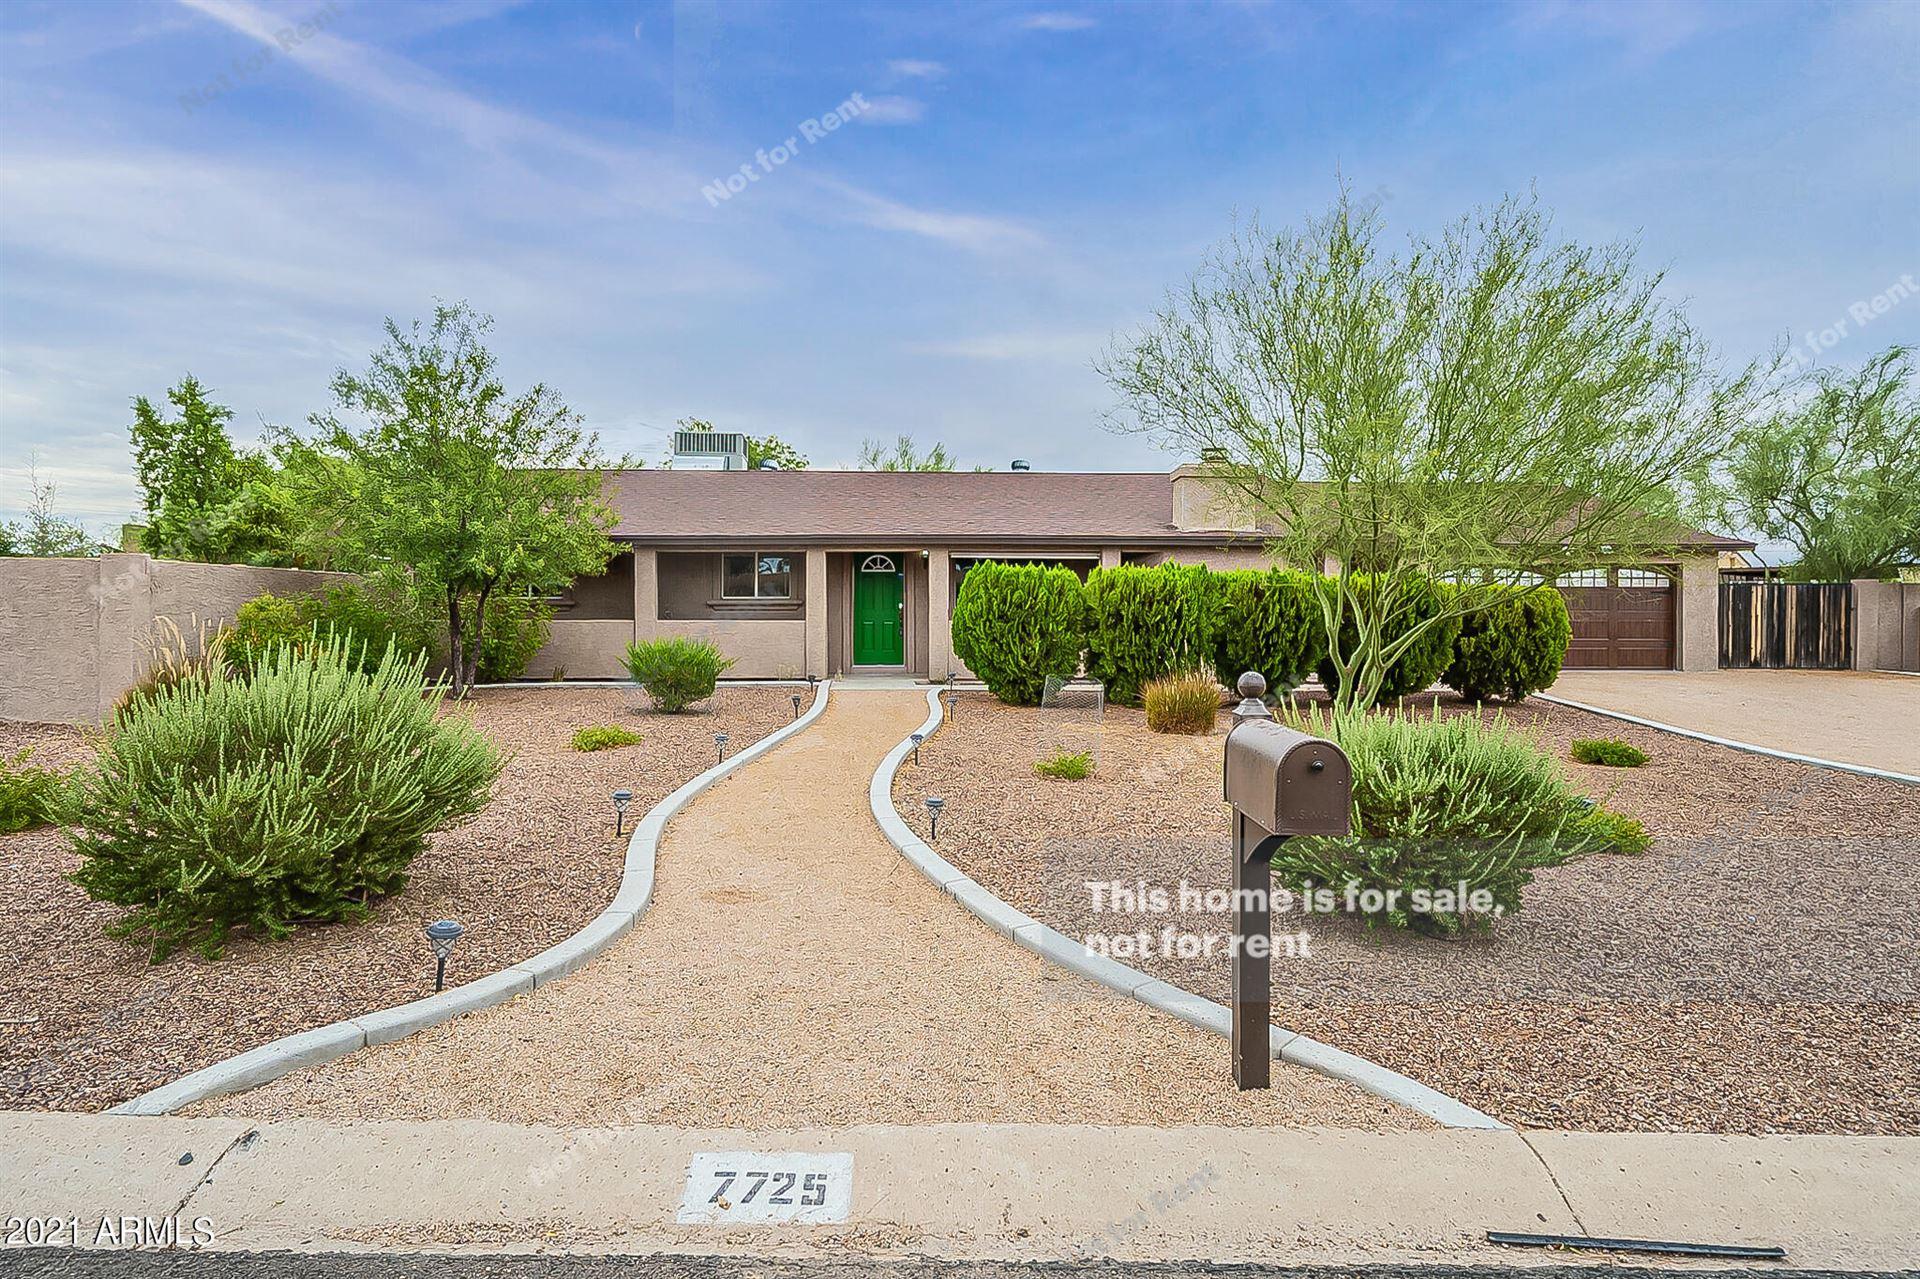 7725 E MANGUN Road, Mesa, AZ 85207 - #: 6260378